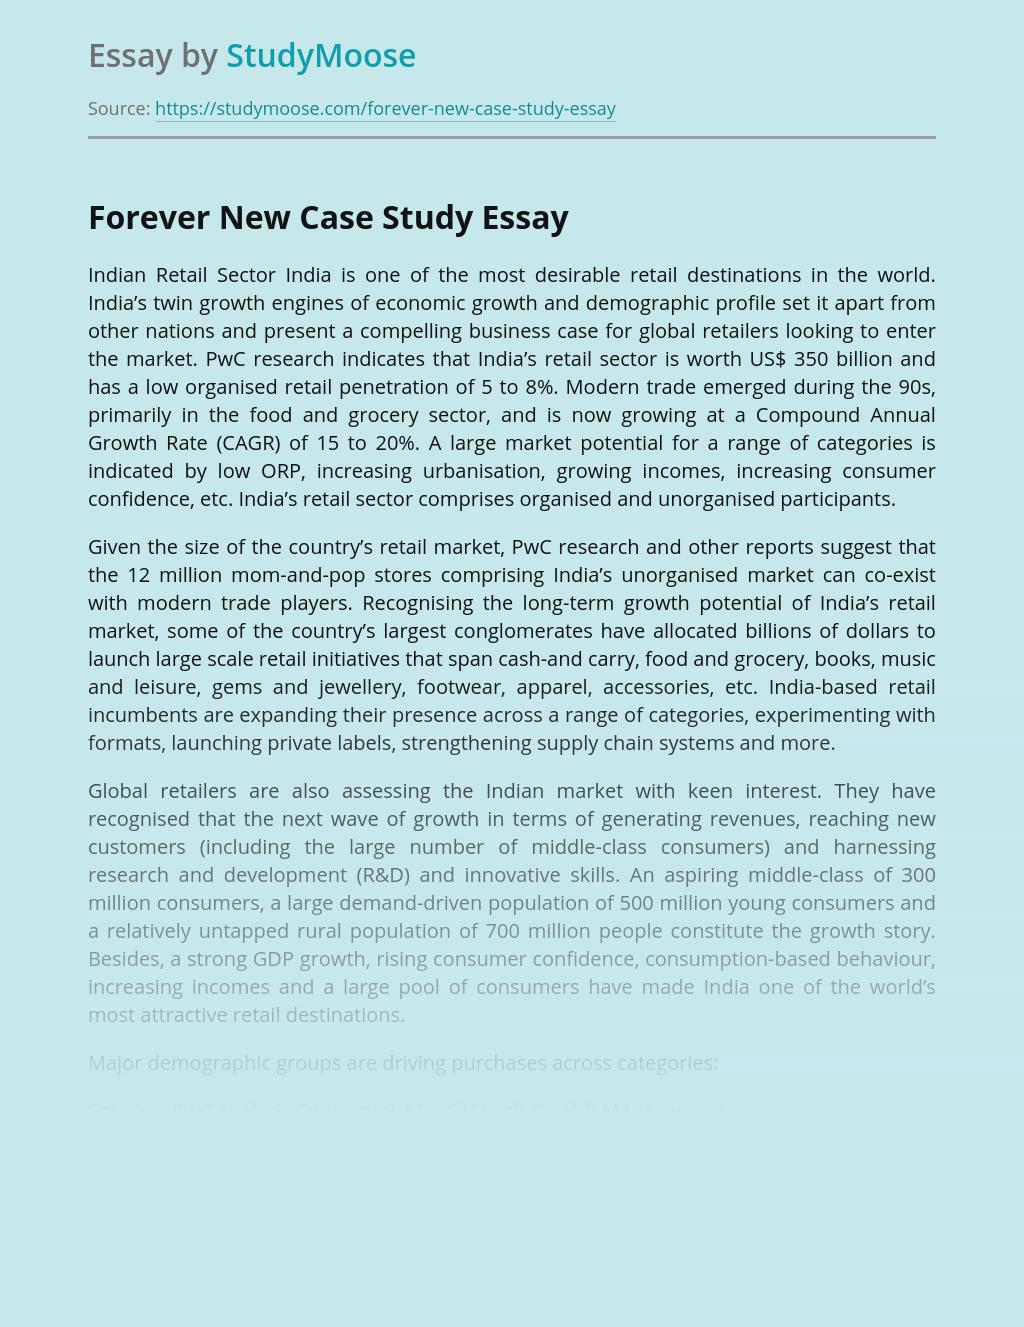 Forever New Case Study